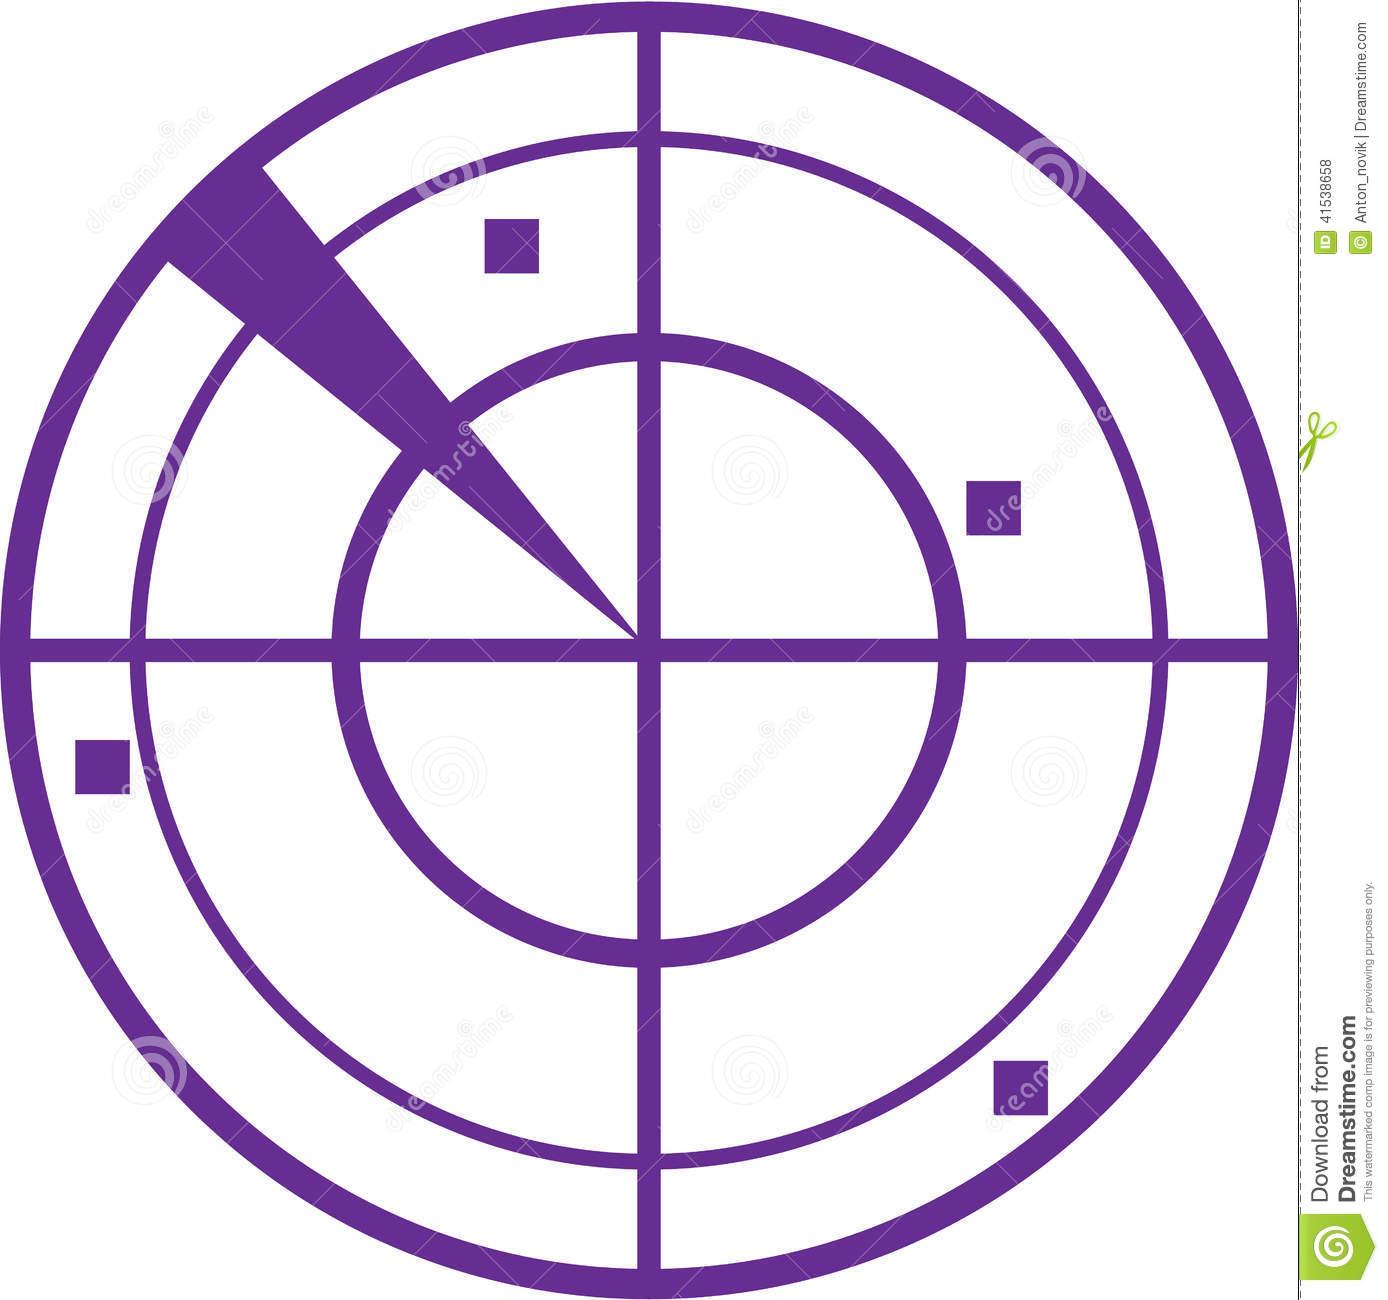 1388x1300 Radar Clip Art Clipart Panda